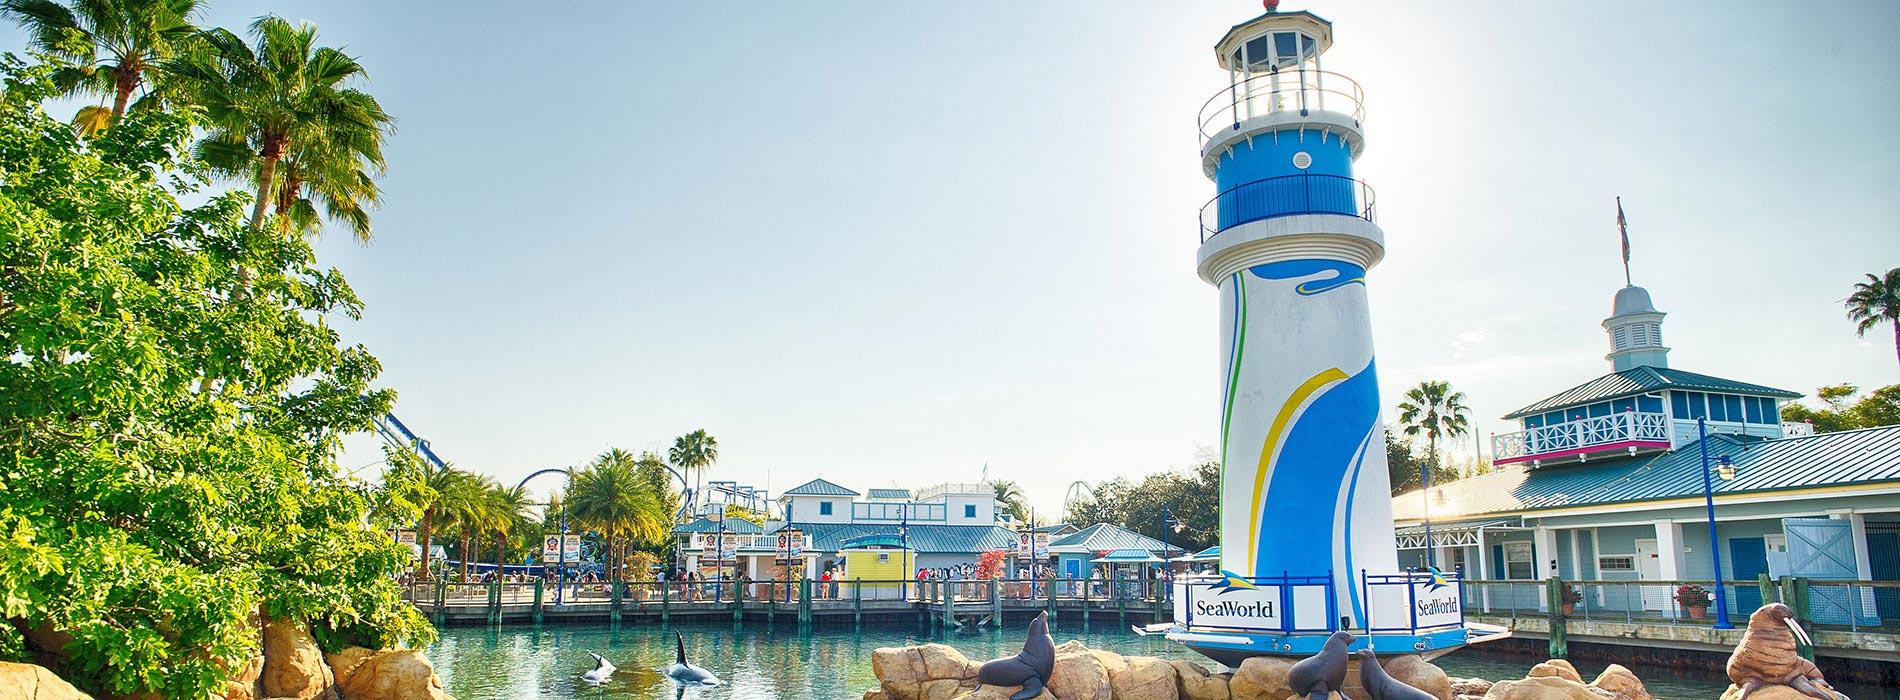 SeaWorld Orlando Front Entrance